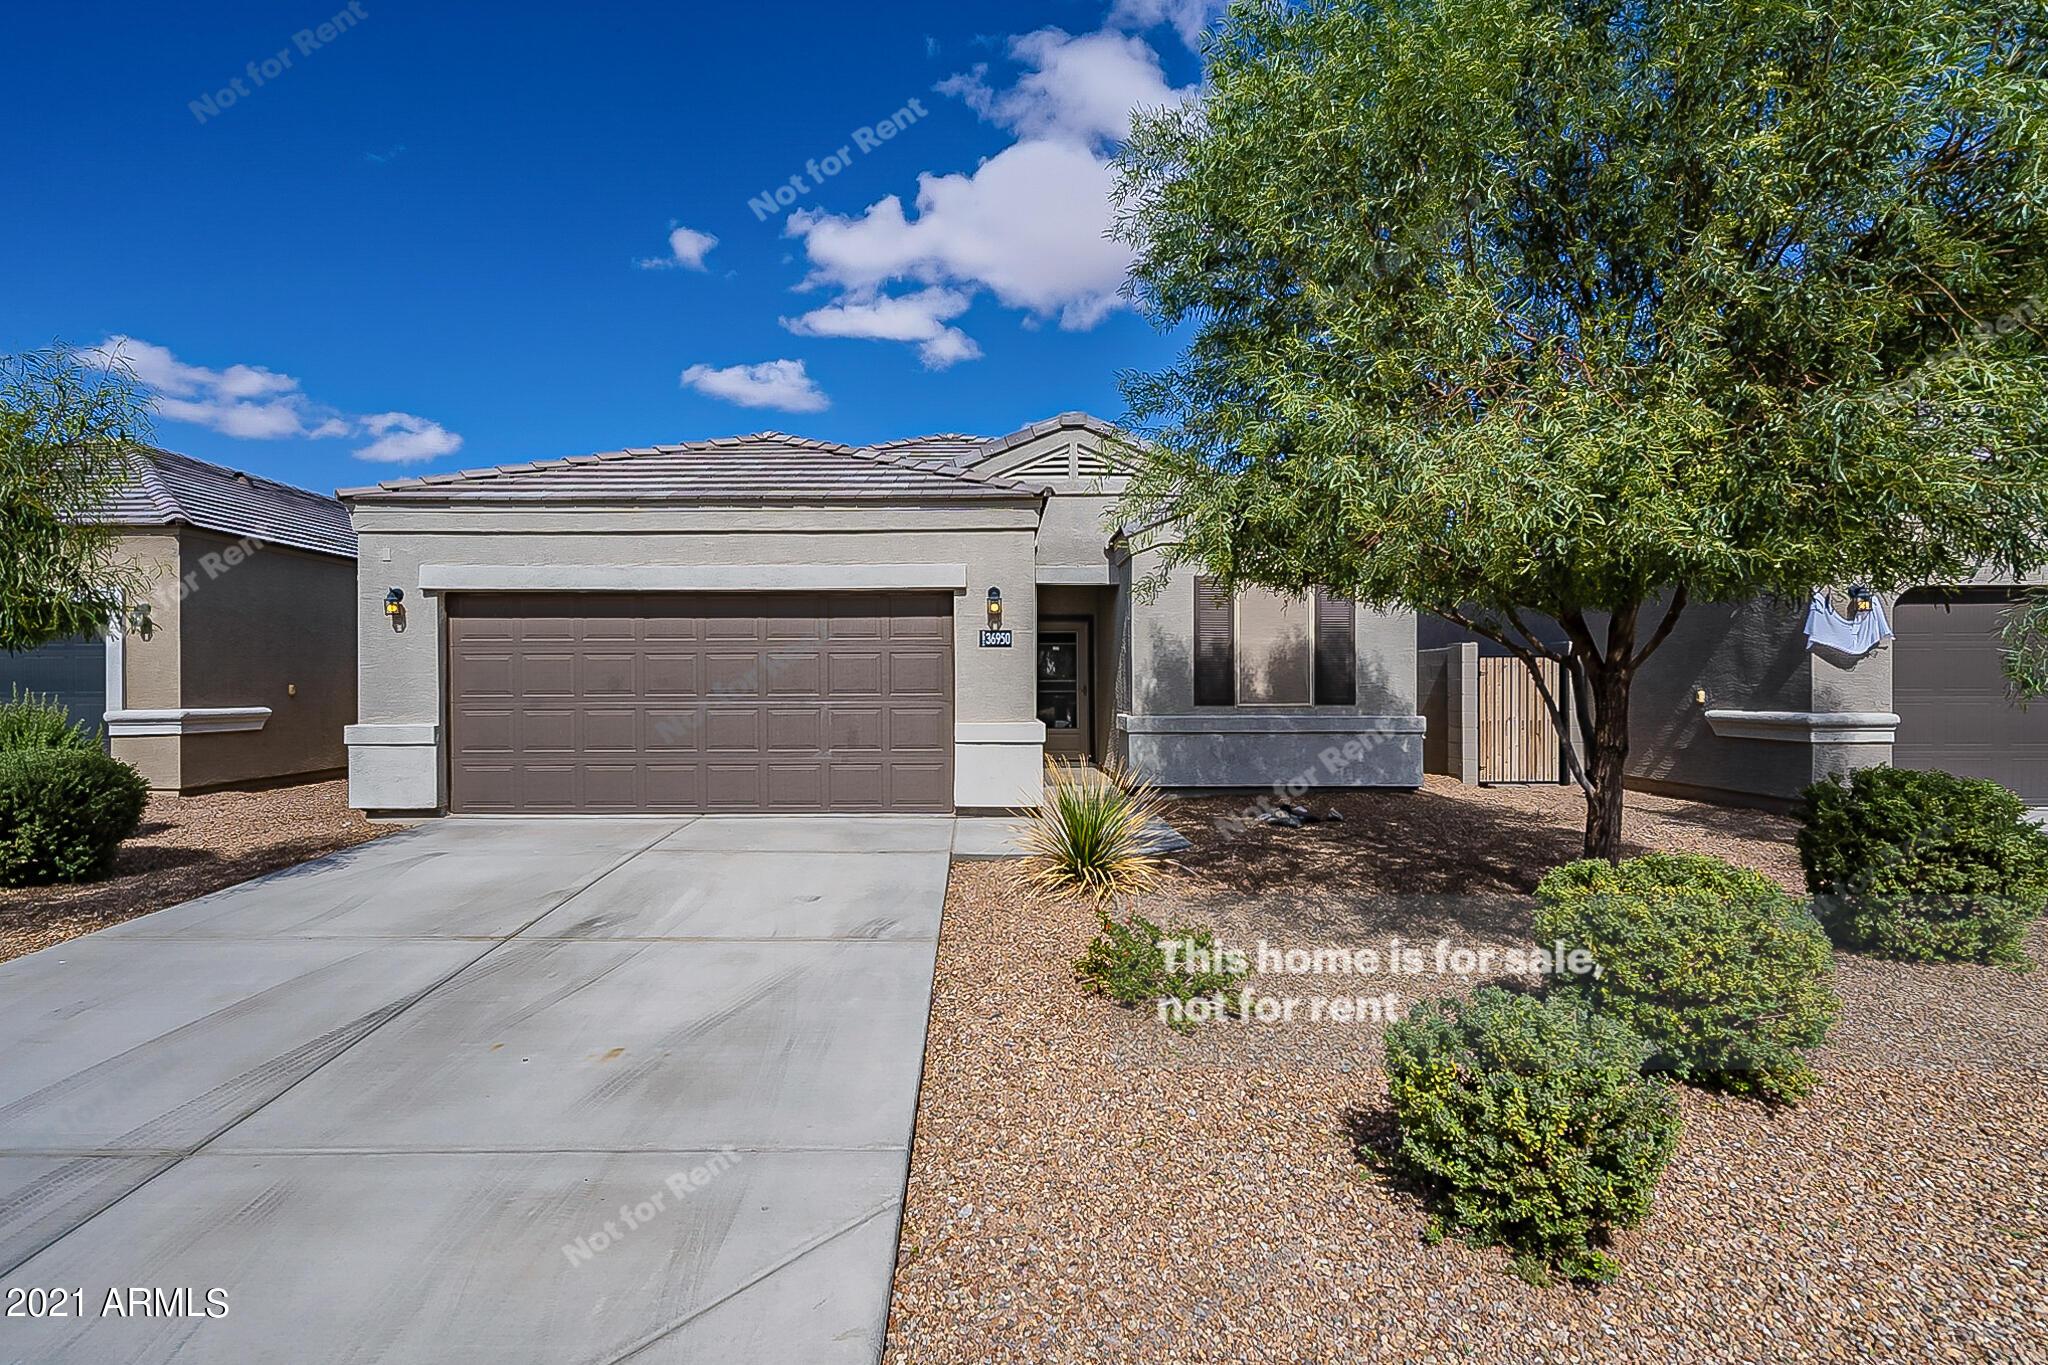 36950 W MADDALONI Avenue, Maricopa, AZ 85138, 3 Bedrooms Bedrooms, ,Residential,For Sale,36950 W MADDALONI Avenue,6310486